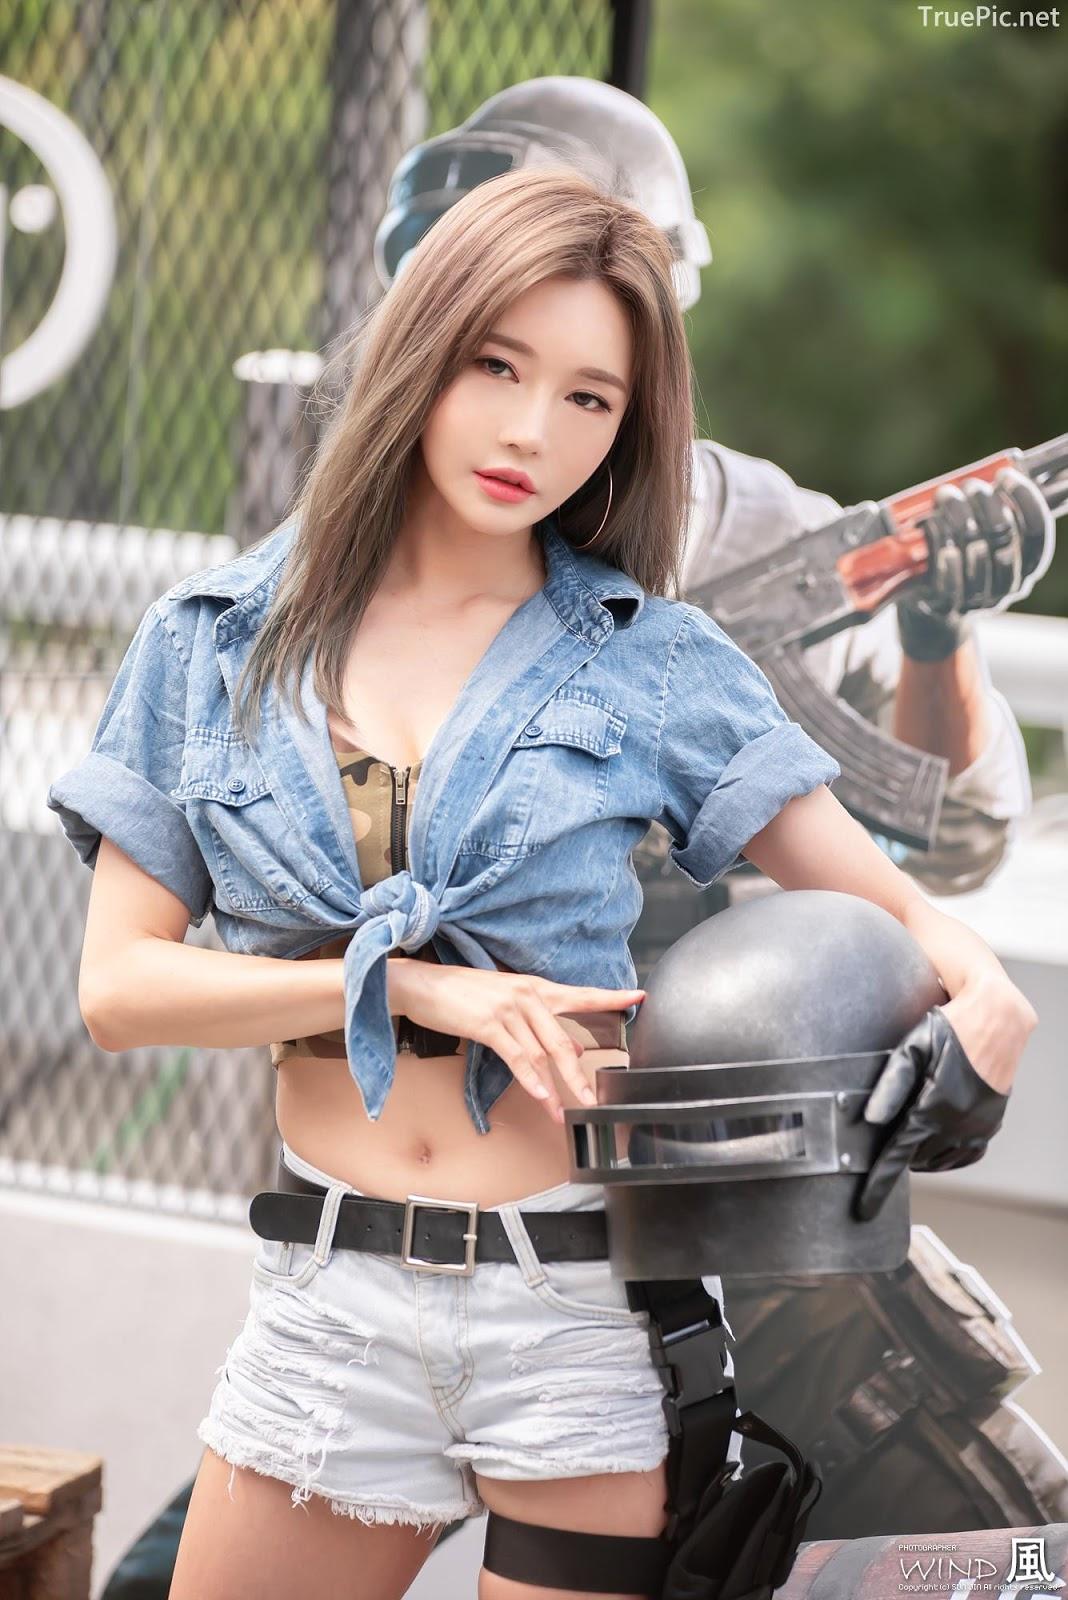 Korean Racing Model - Han Ga Eun - LG Ultragear Festival- Picture 8